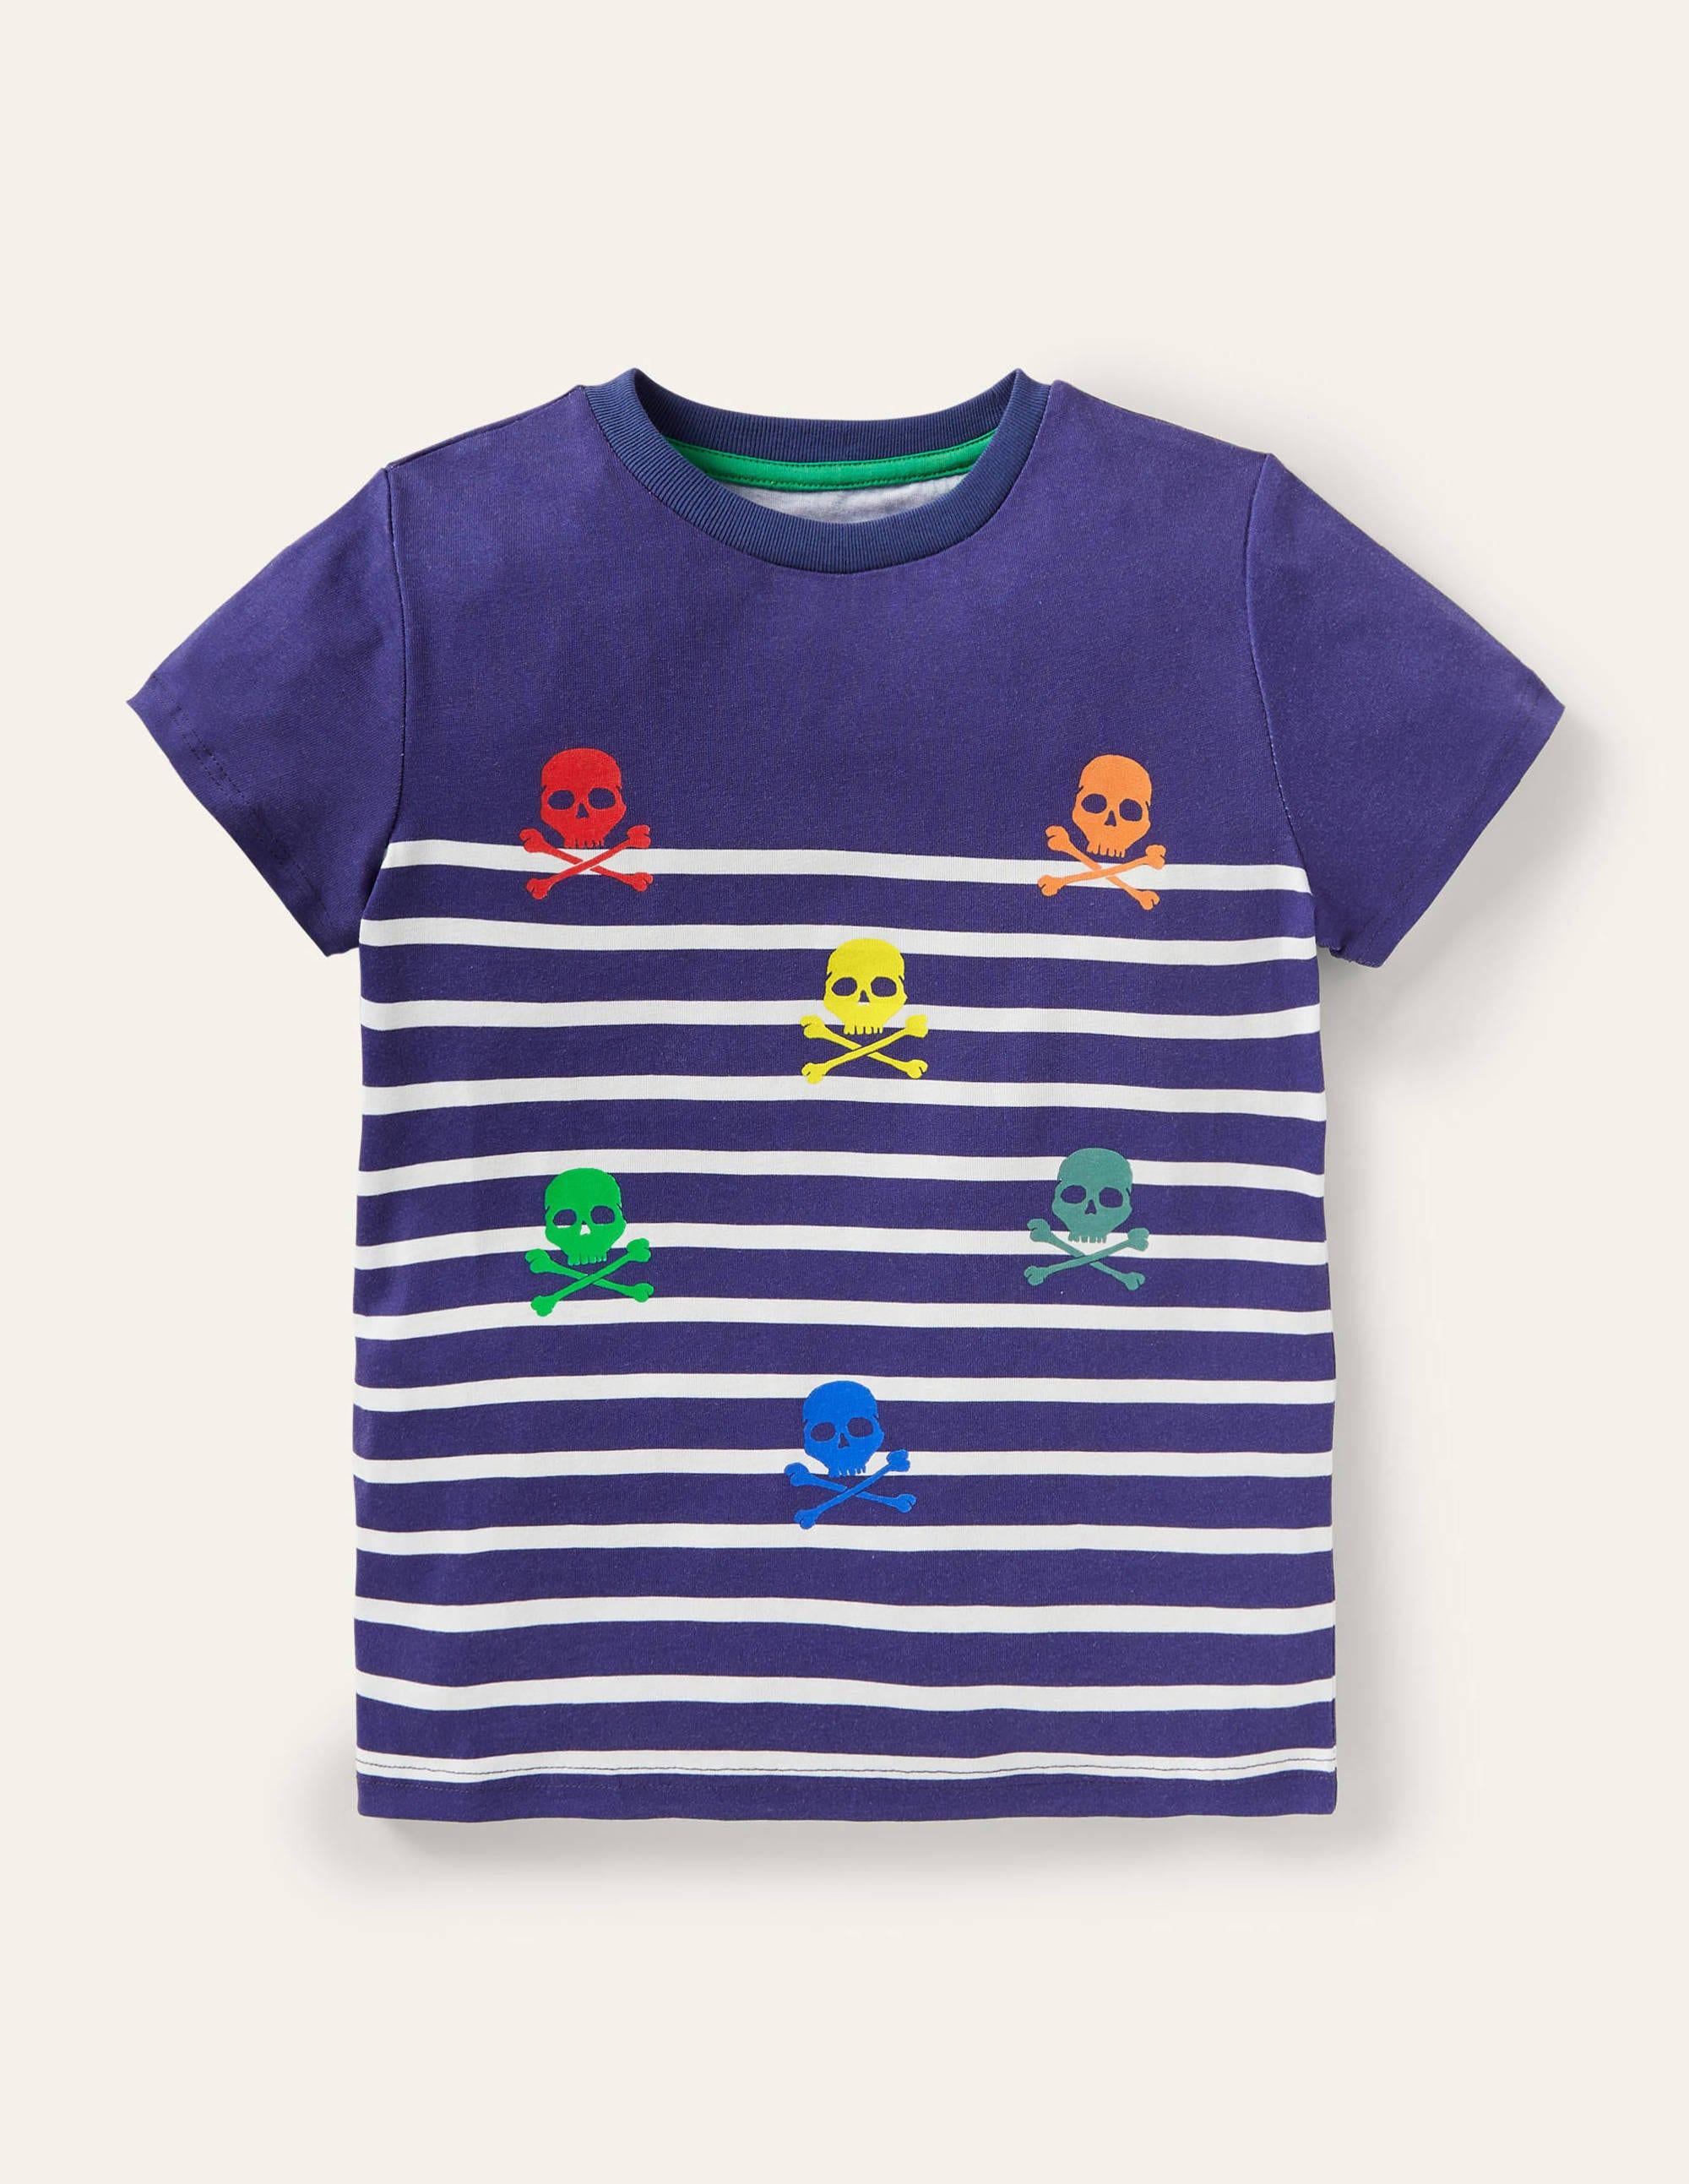 Boden Short-sleeved Breton T-shirt - College Navy/Ivory Skulls